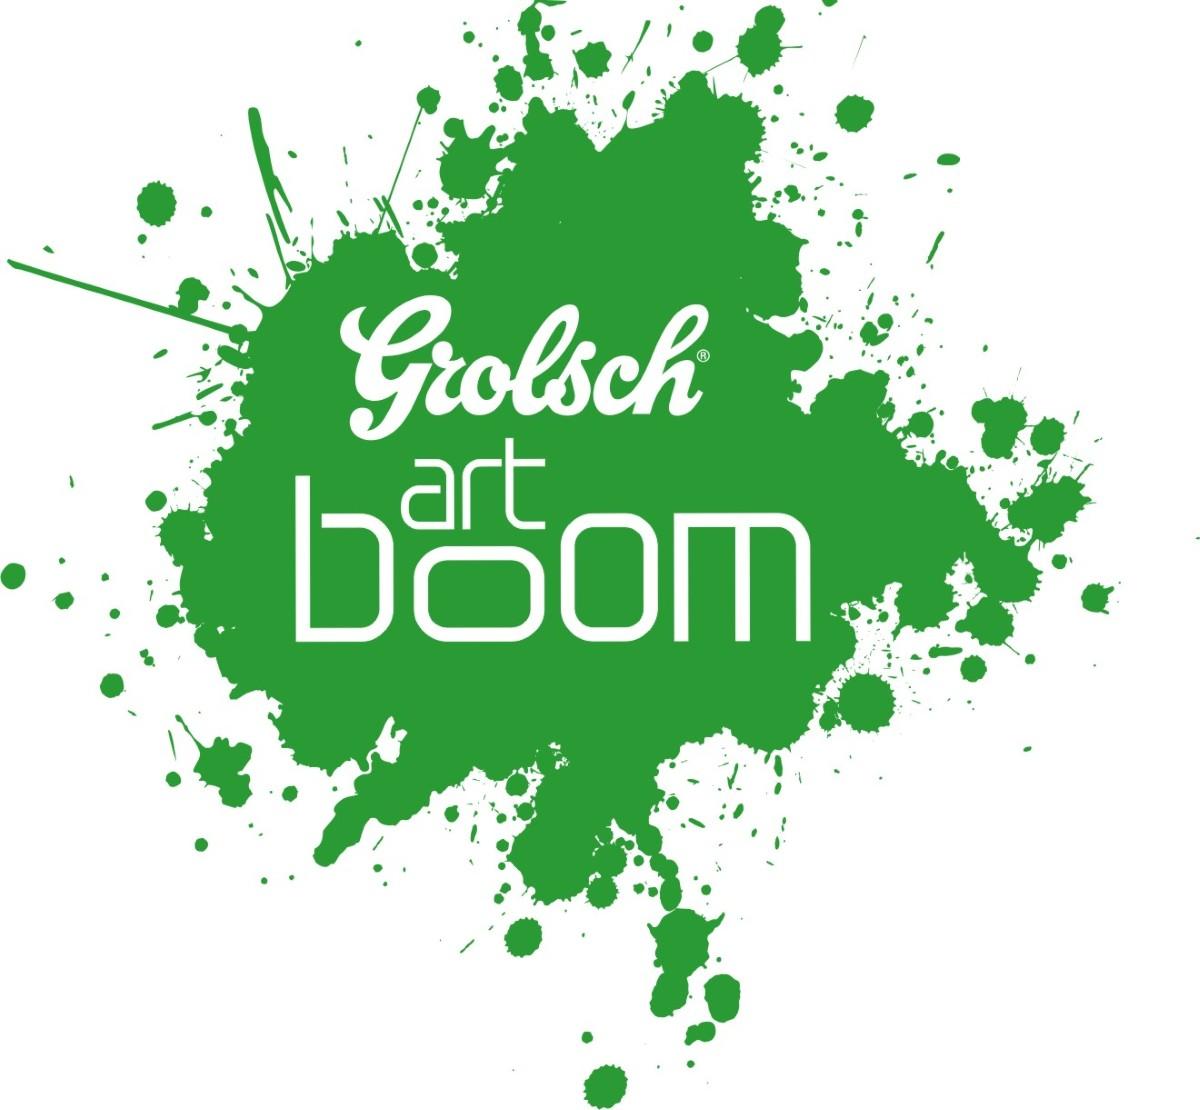 Grolsch Artboom, logo (źródło: mat. prasowe)